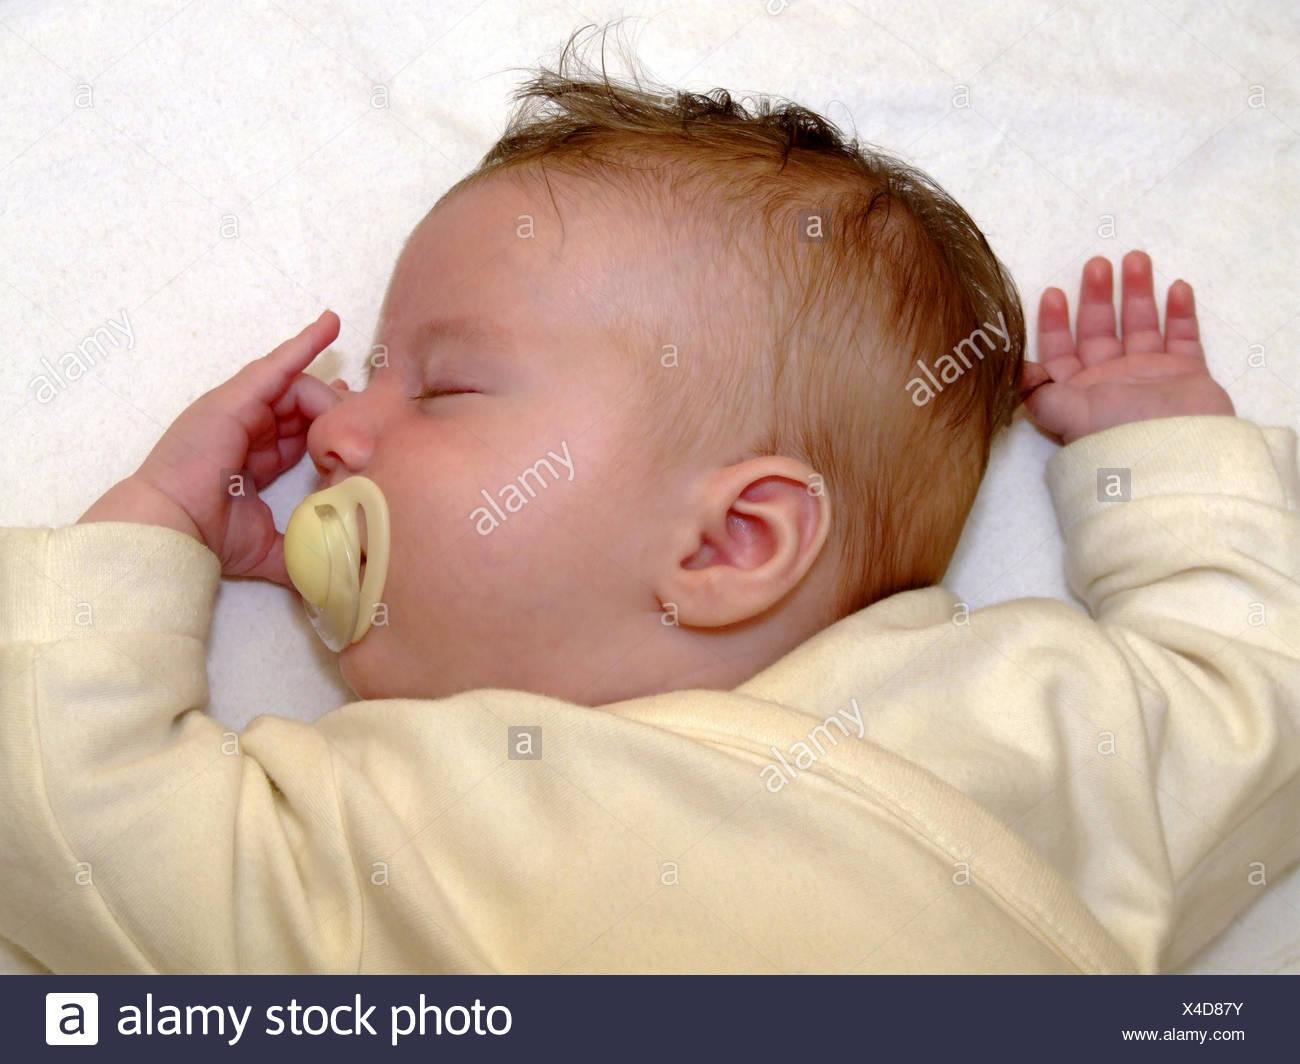 Schlaf / to sleep - Stock Image